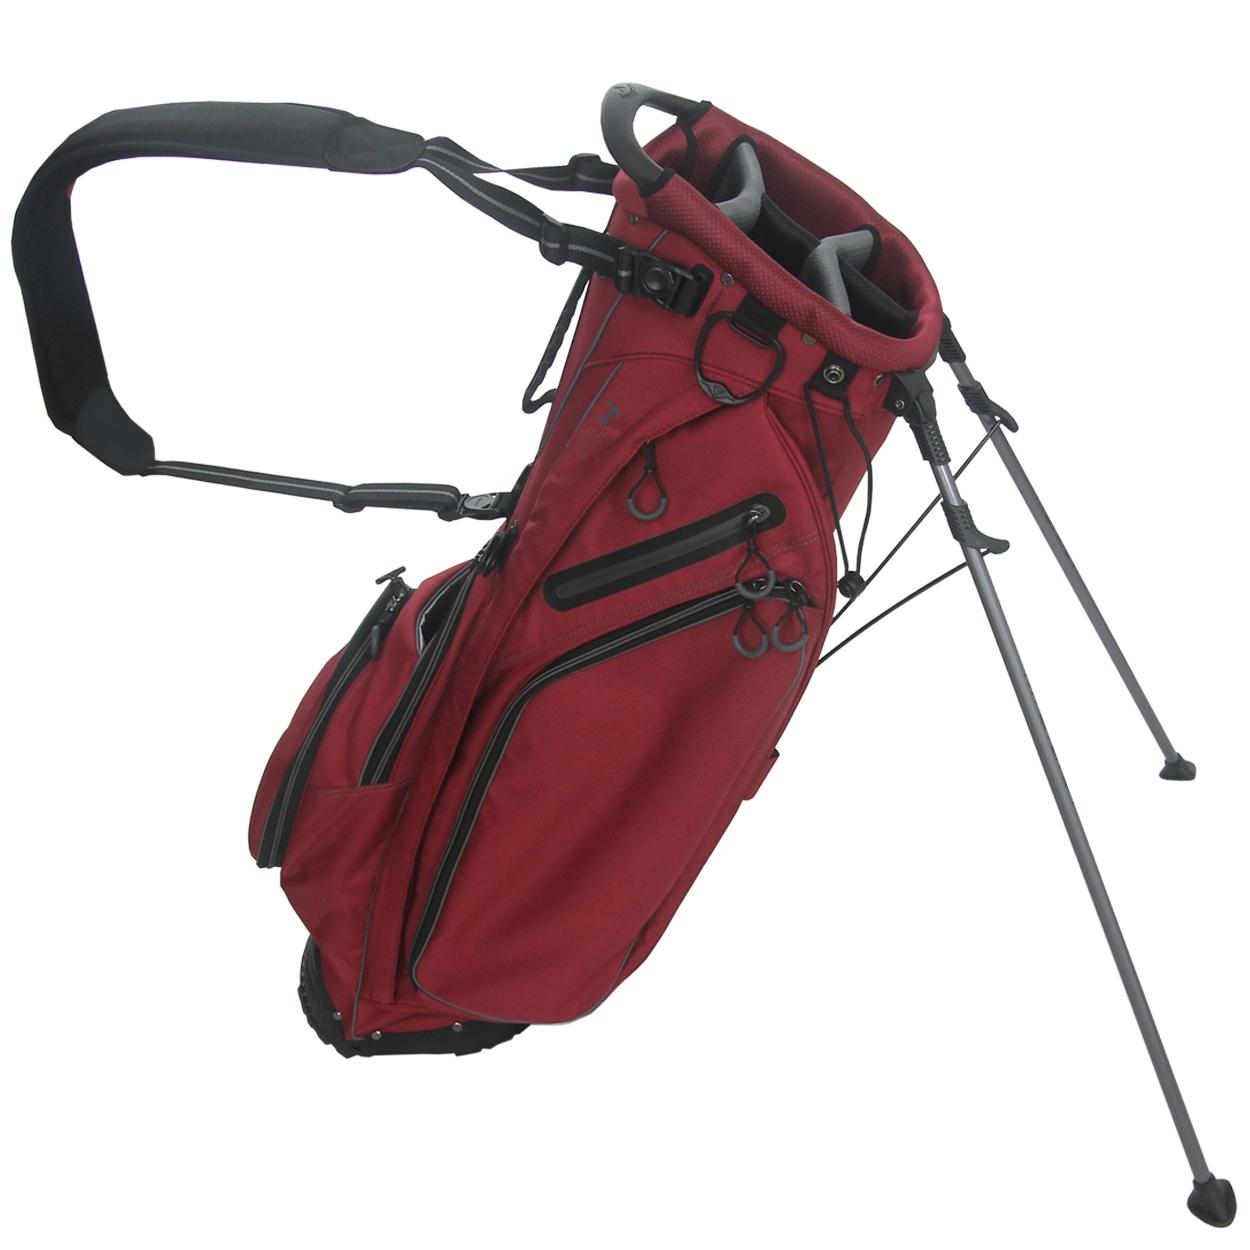 Callaway Hyper Lite 4 Single Strap Stand Bag Golfetailcom